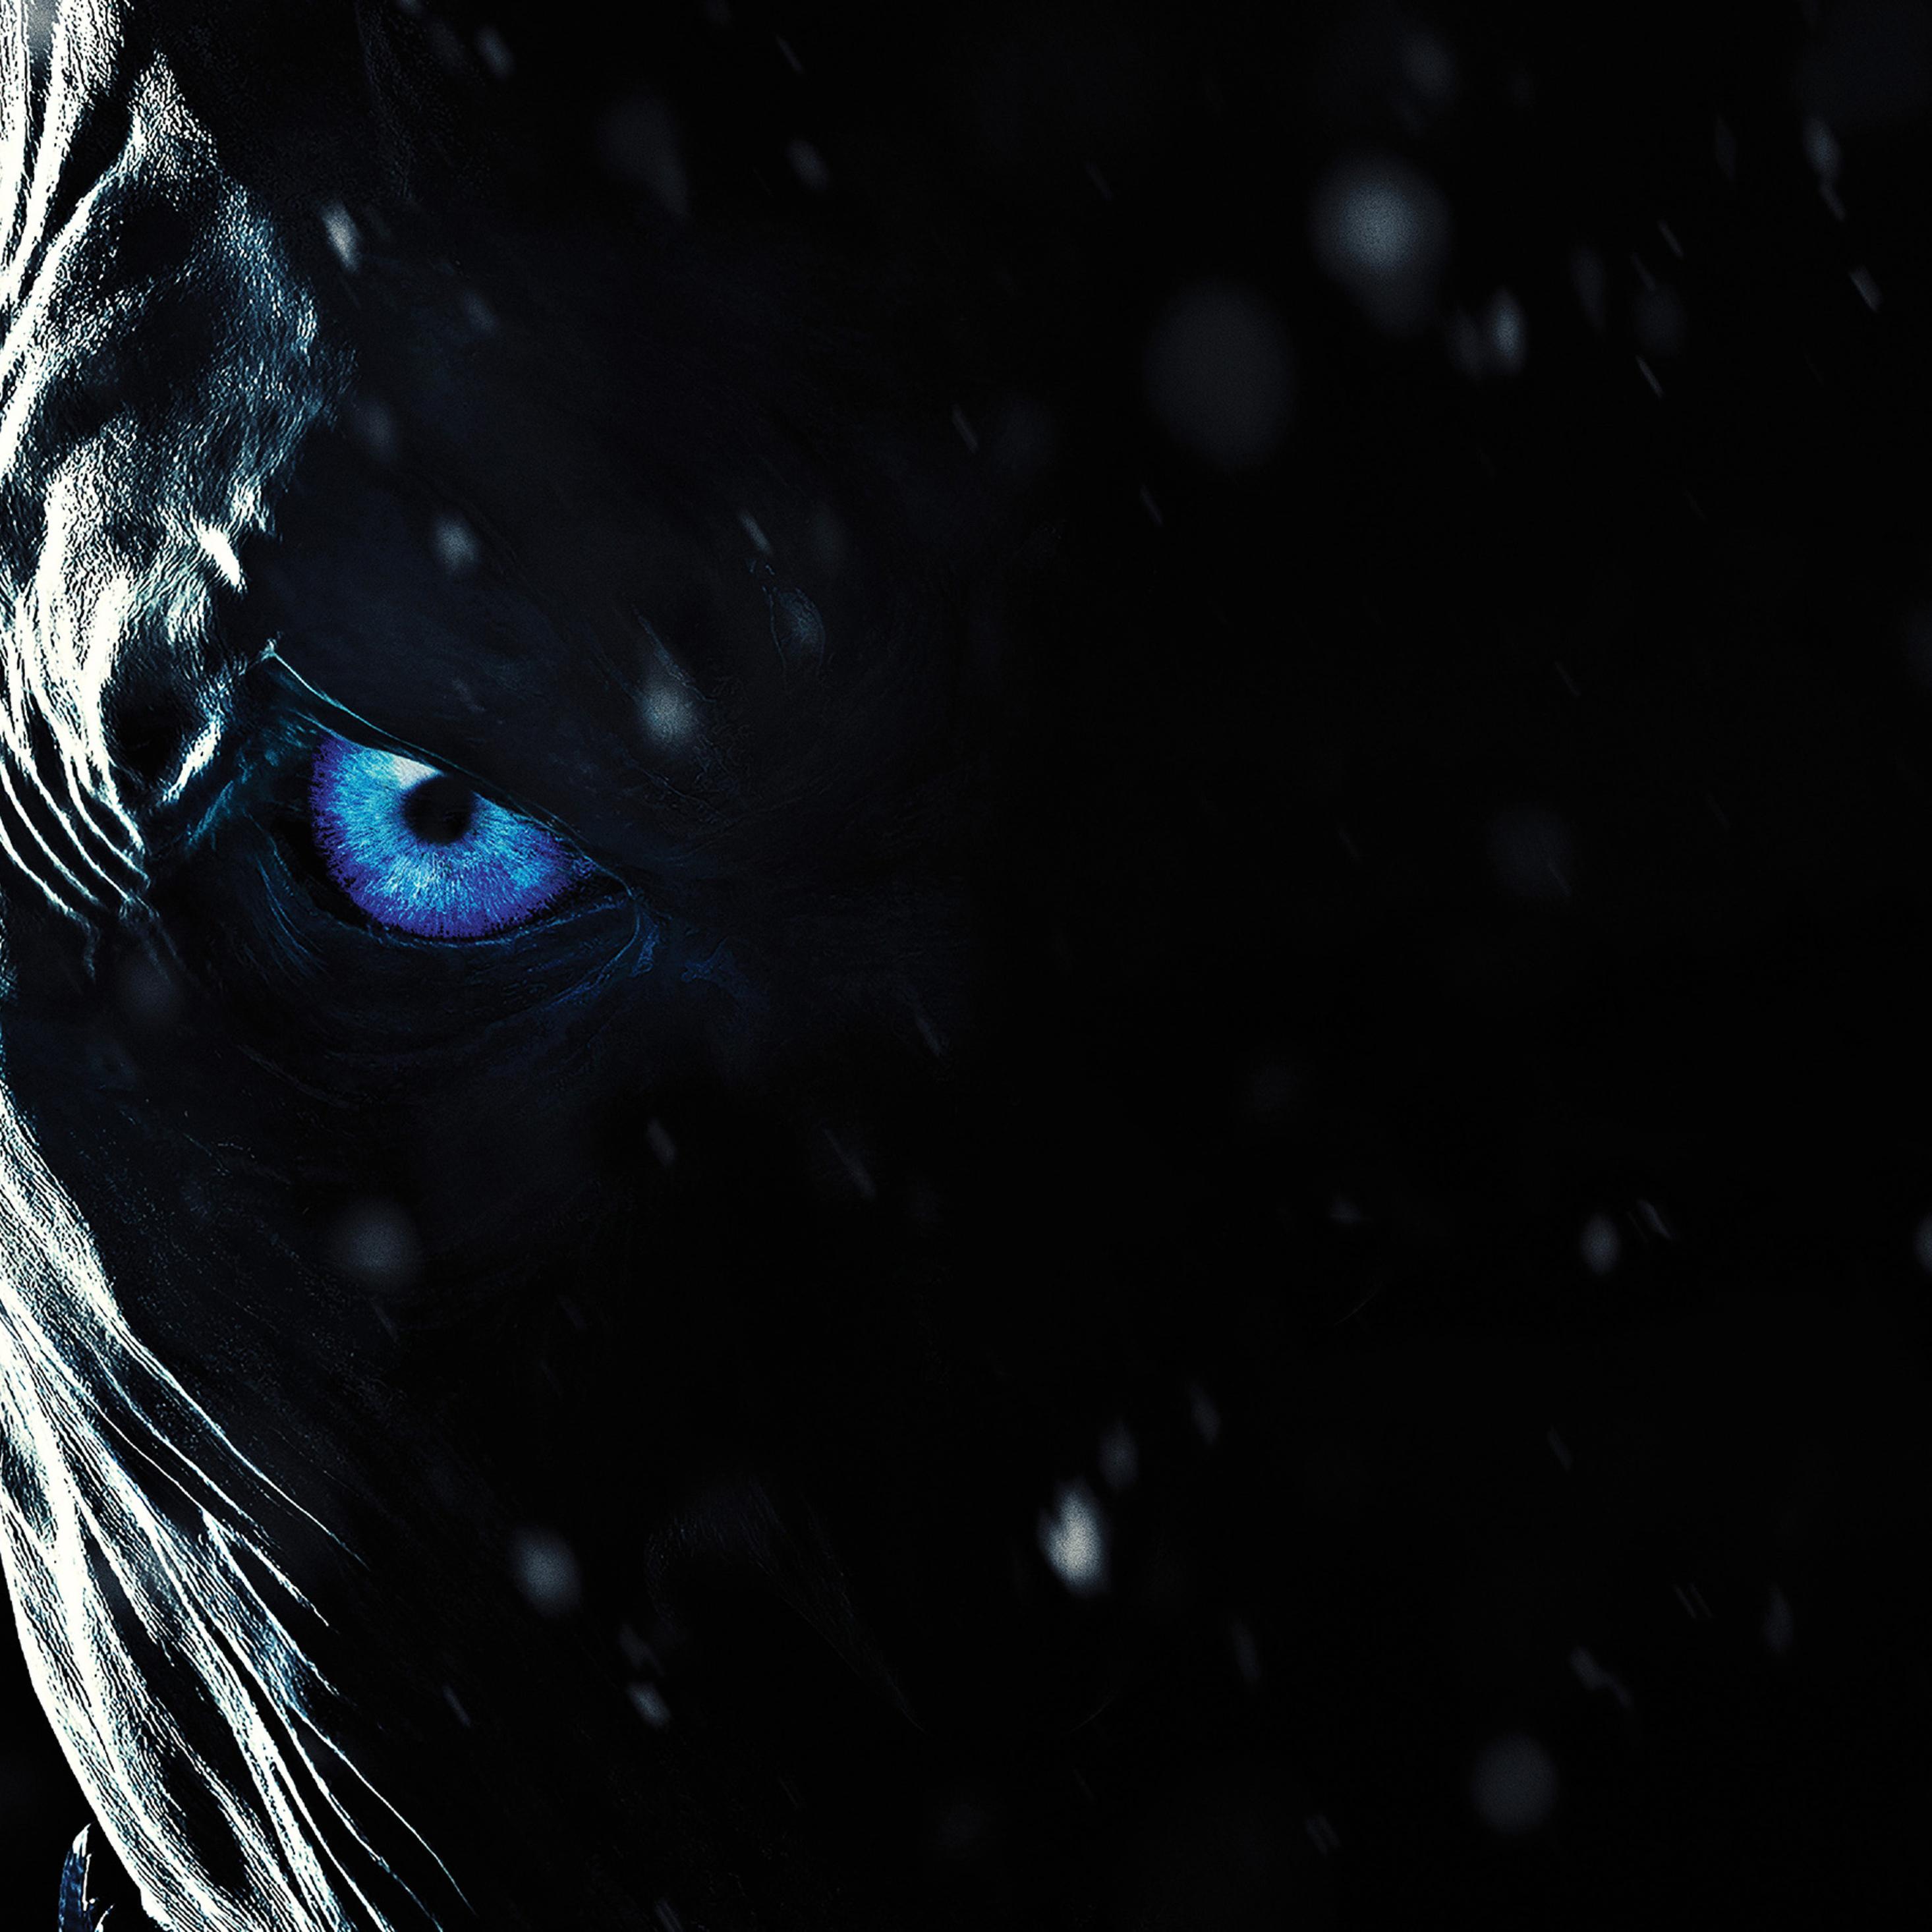 2932x2932 Game Of Thrones Season 7 White Walkers Ipad Pro